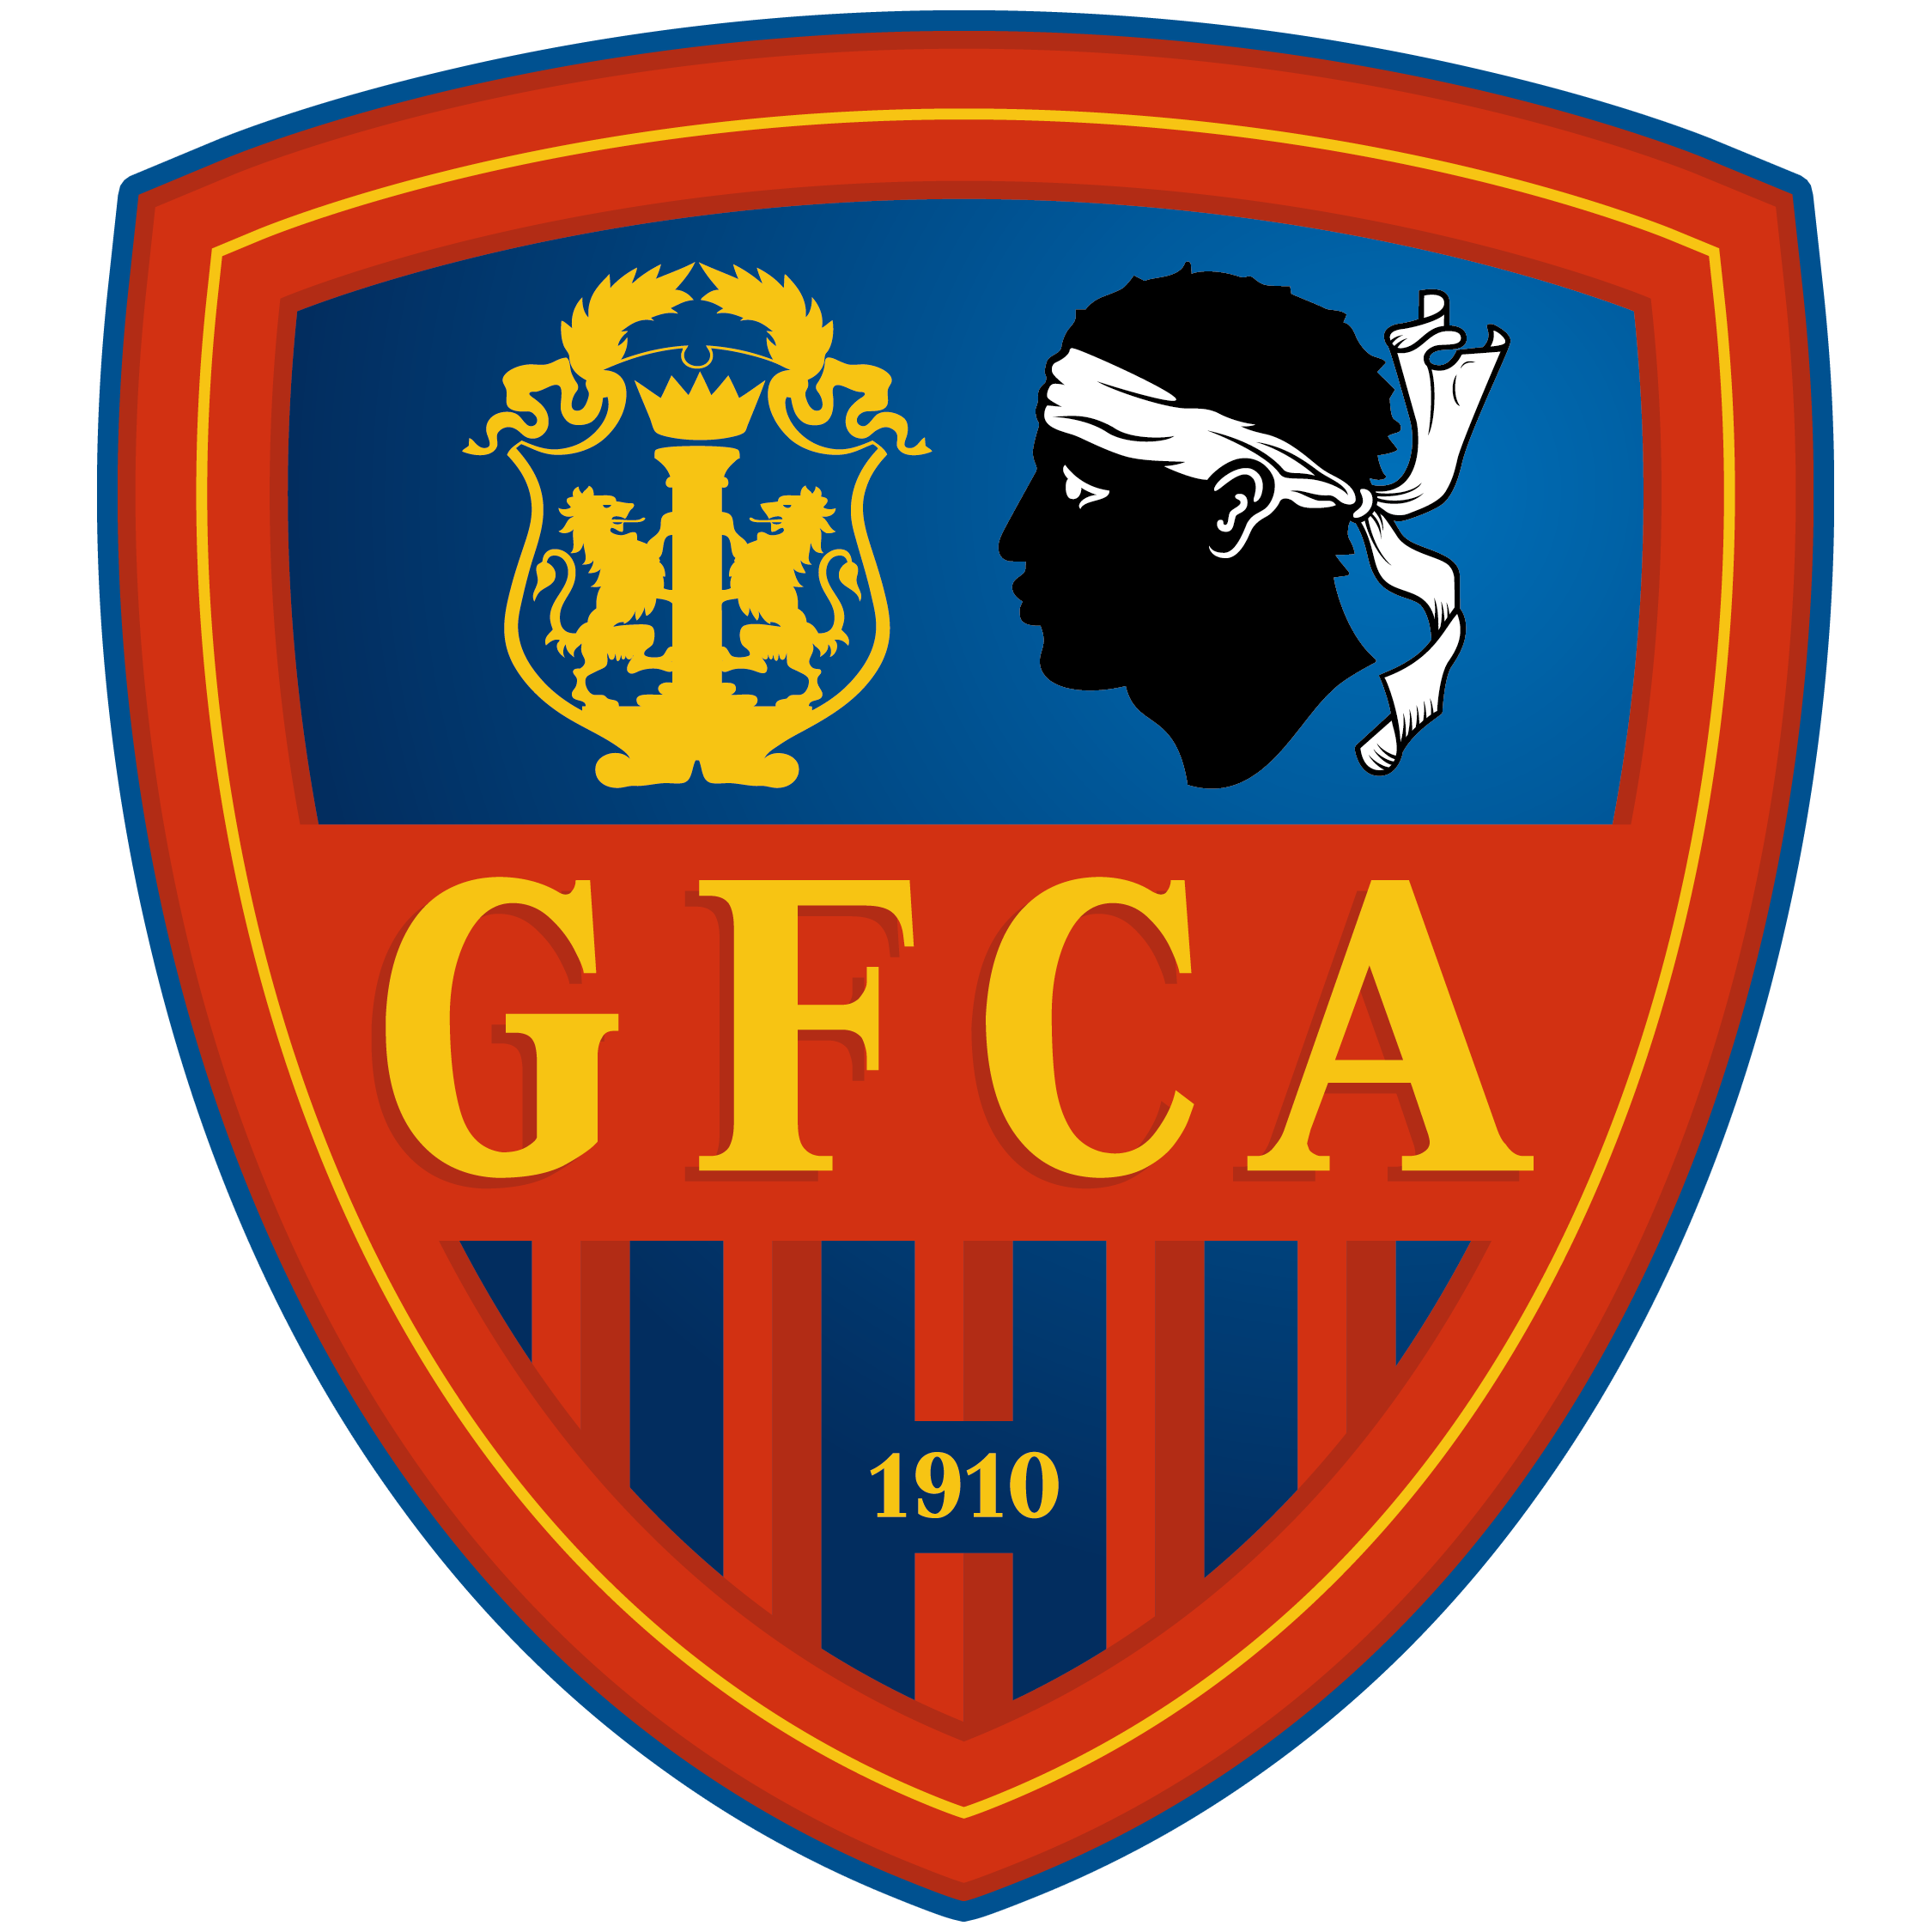 GFCA Football